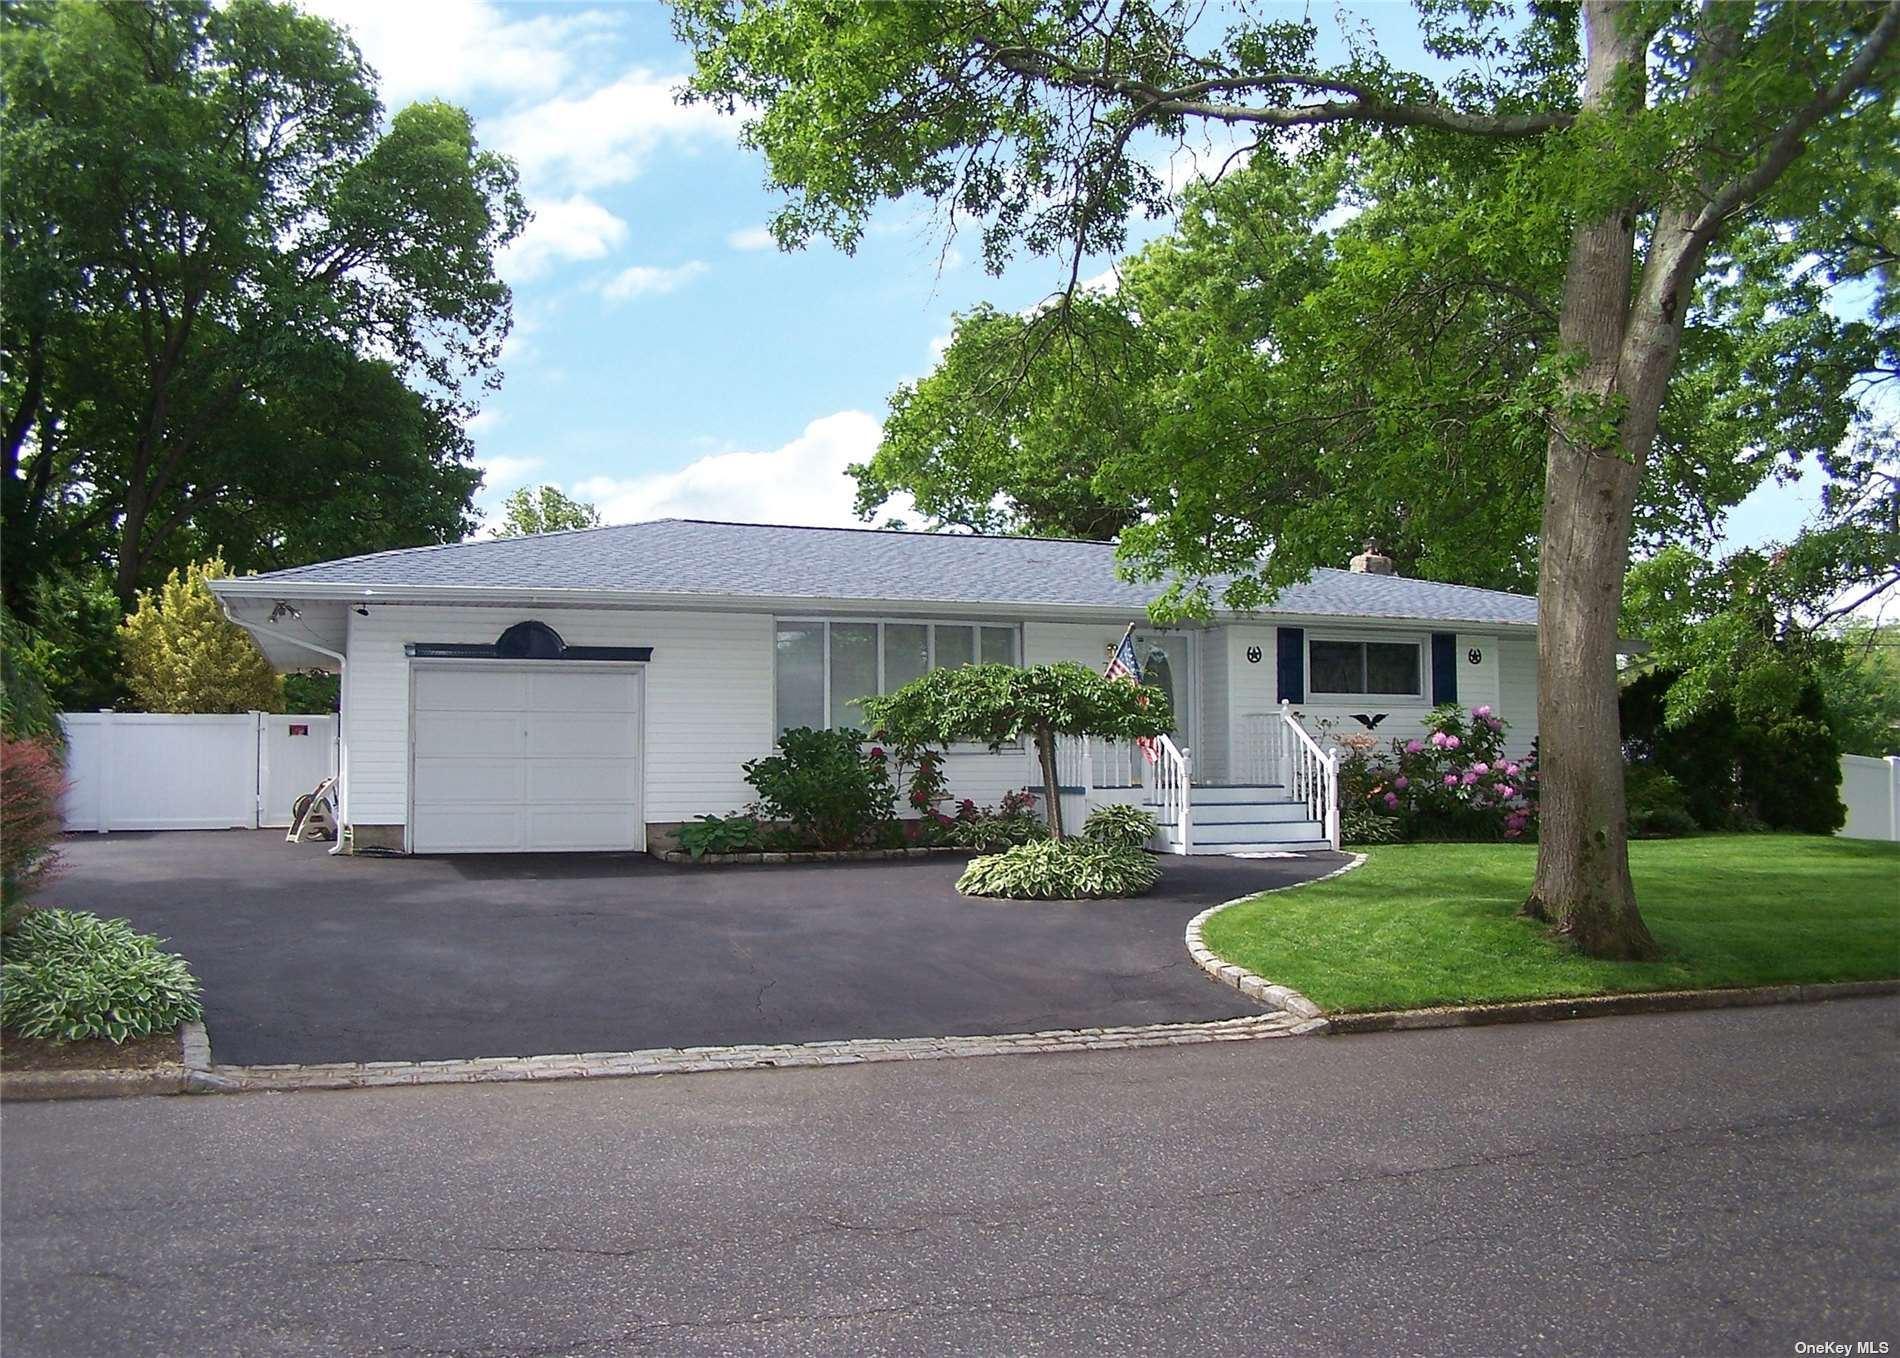 72 Dovecote Lane, Commack, NY 11725 - MLS#: 3318467